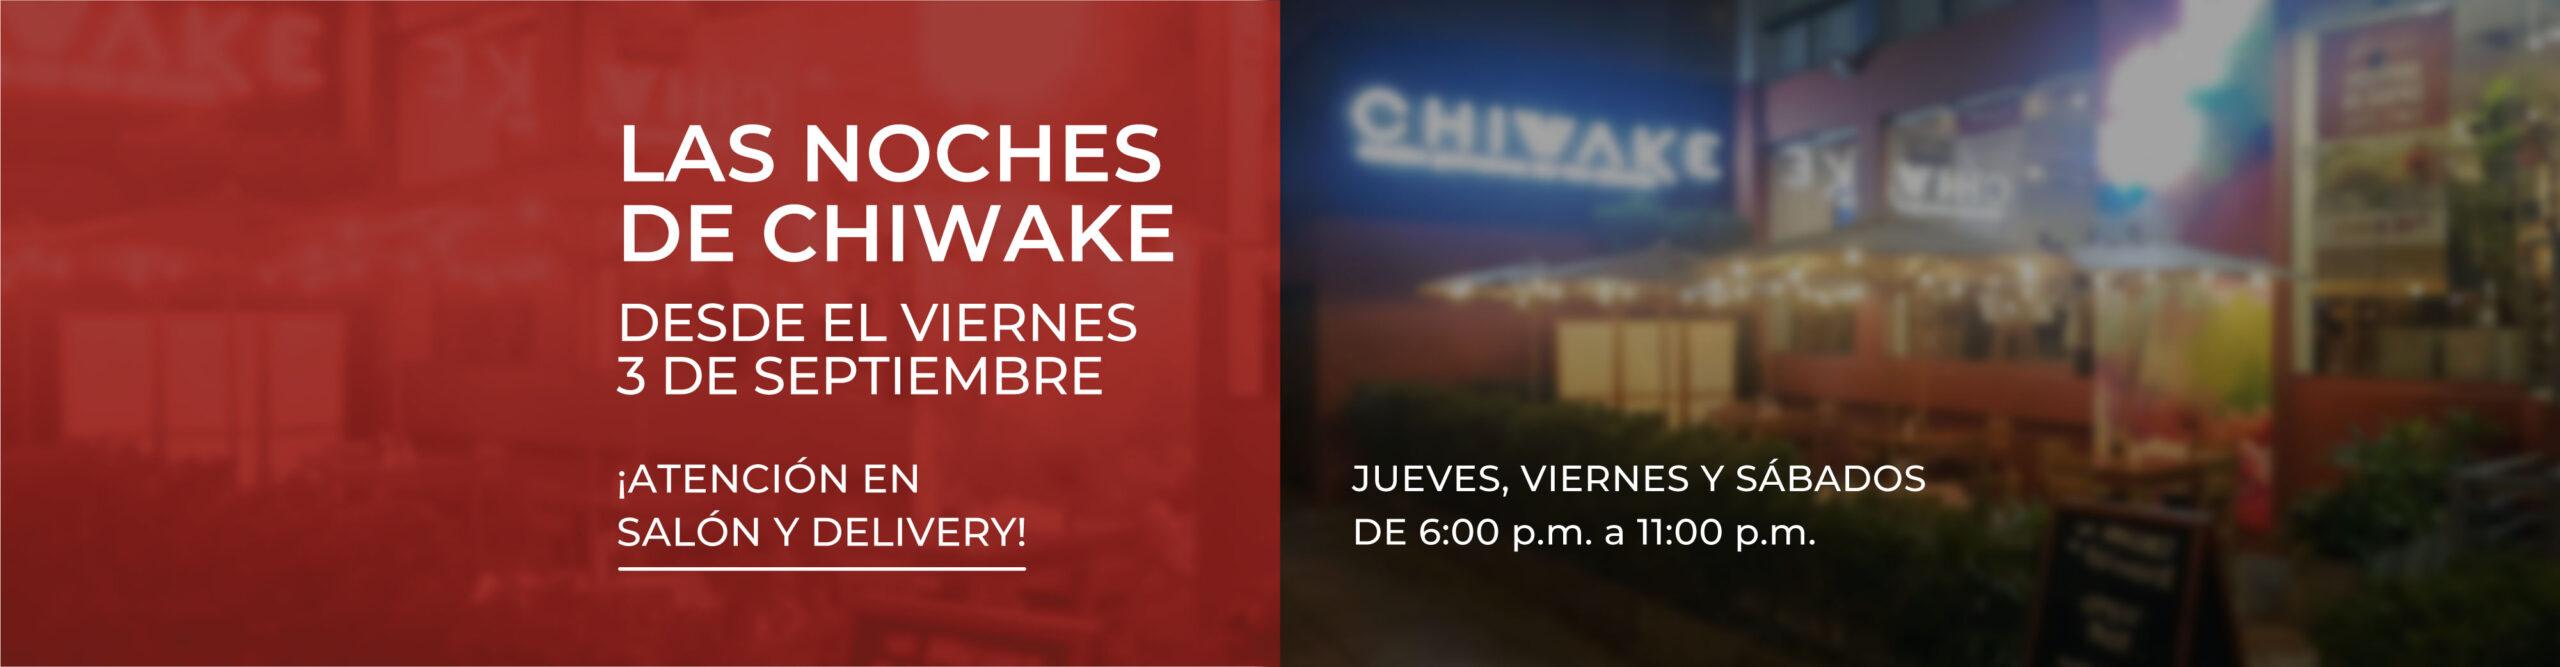 Chiwake_noche_3